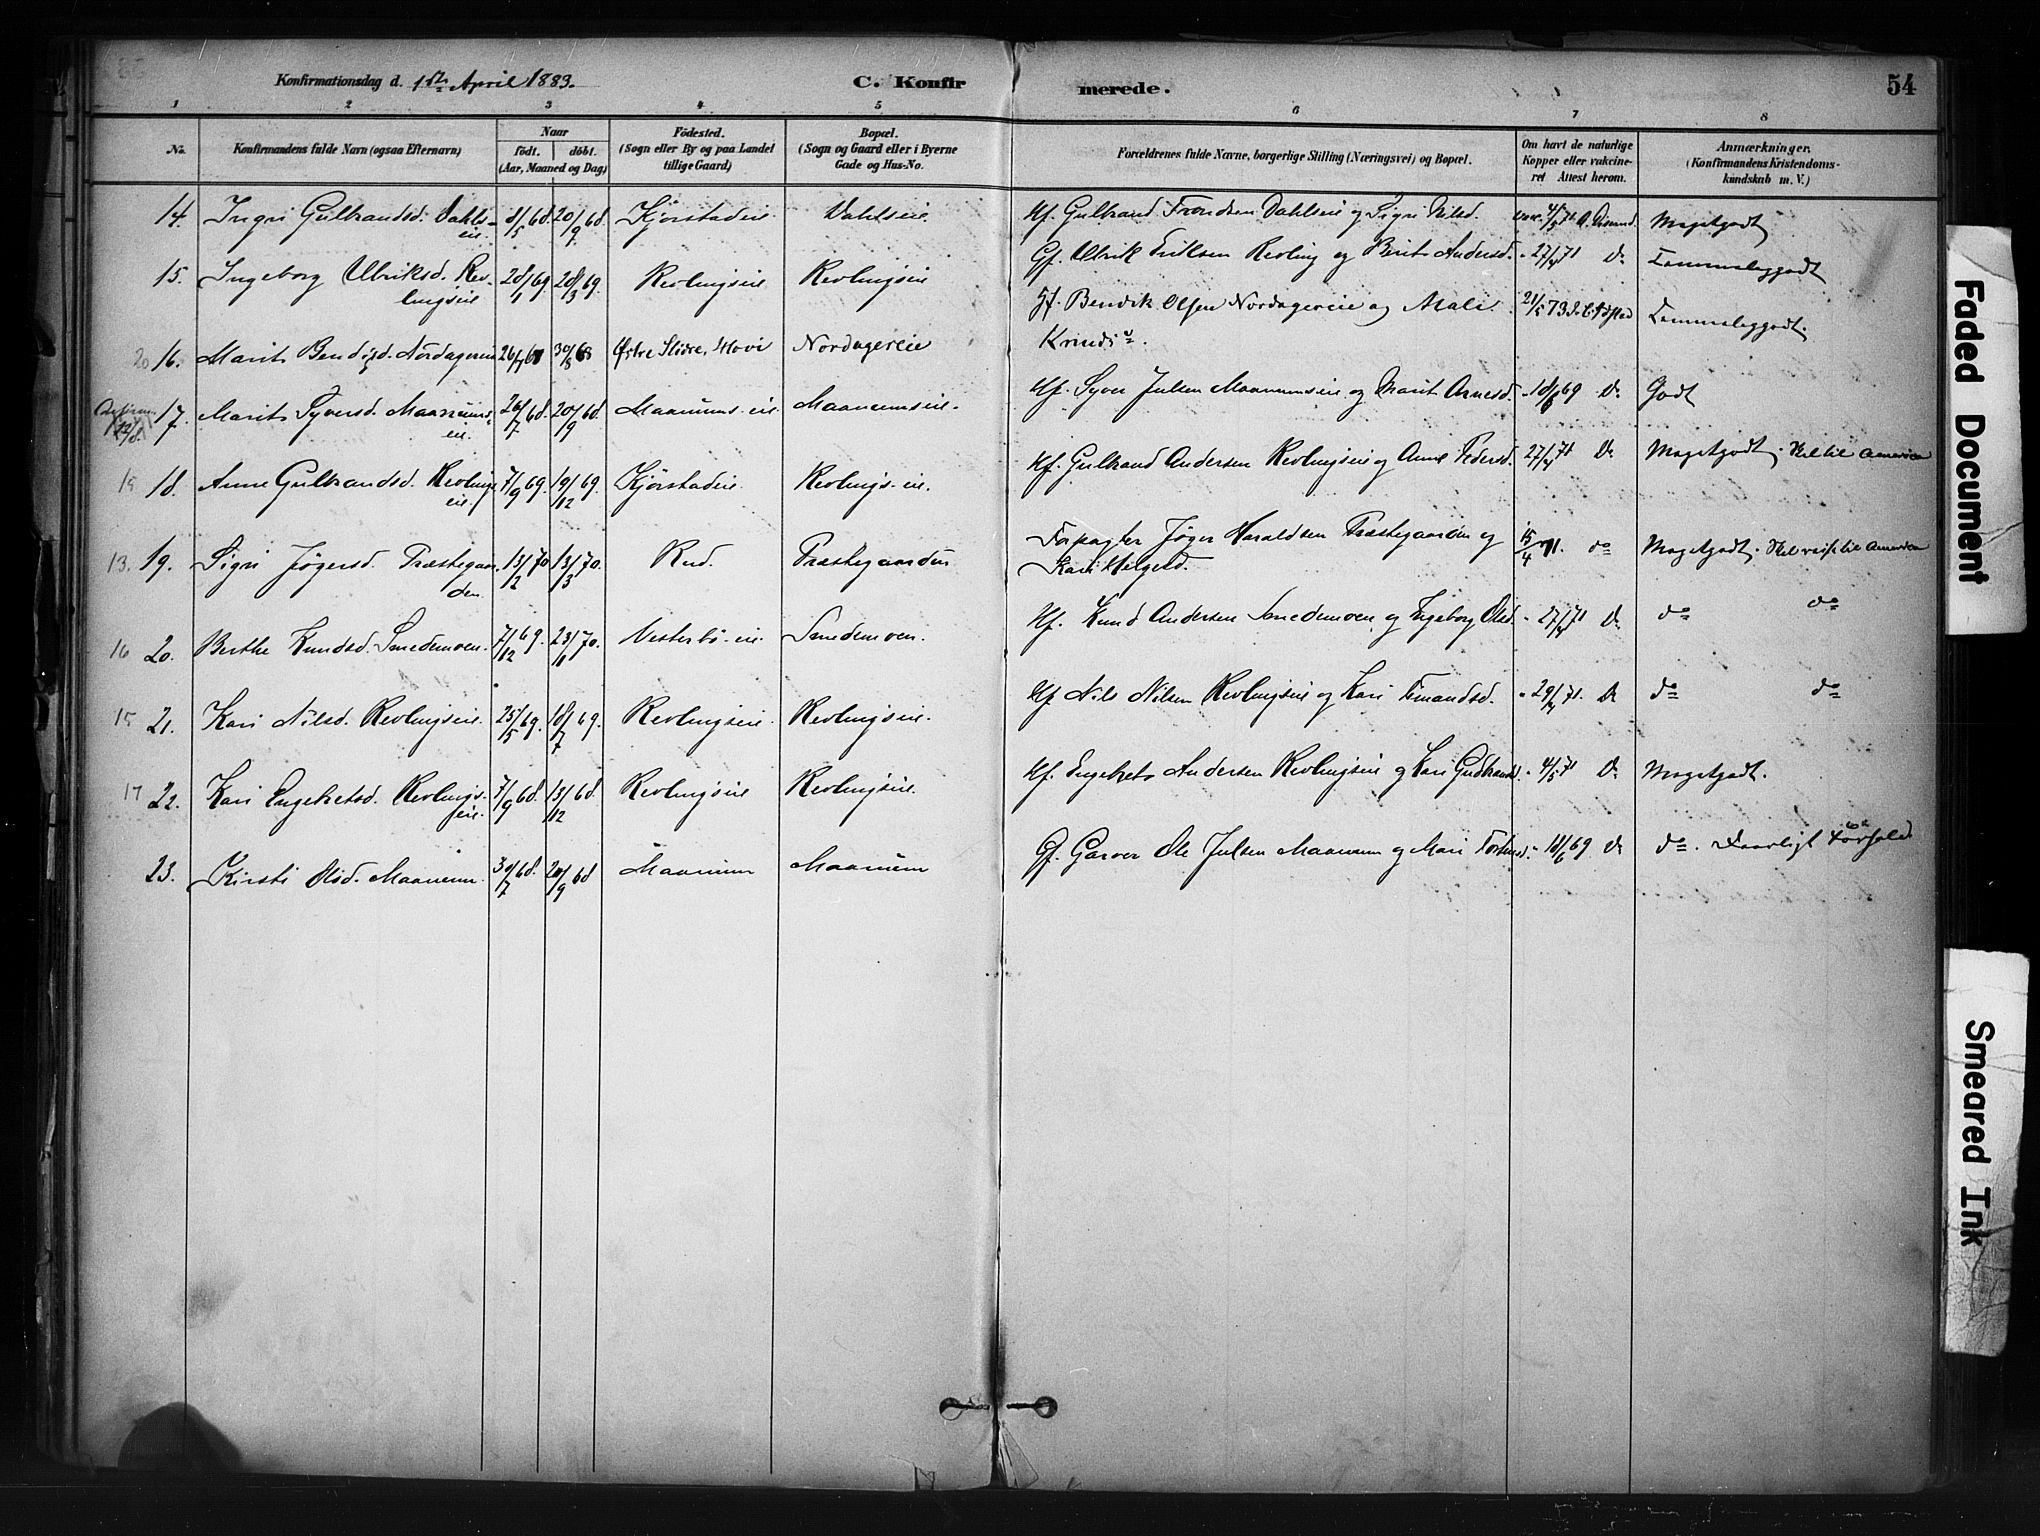 SAH, Nord-Aurdal prestekontor, Ministerialbok nr. 13, 1883-1895, s. 54